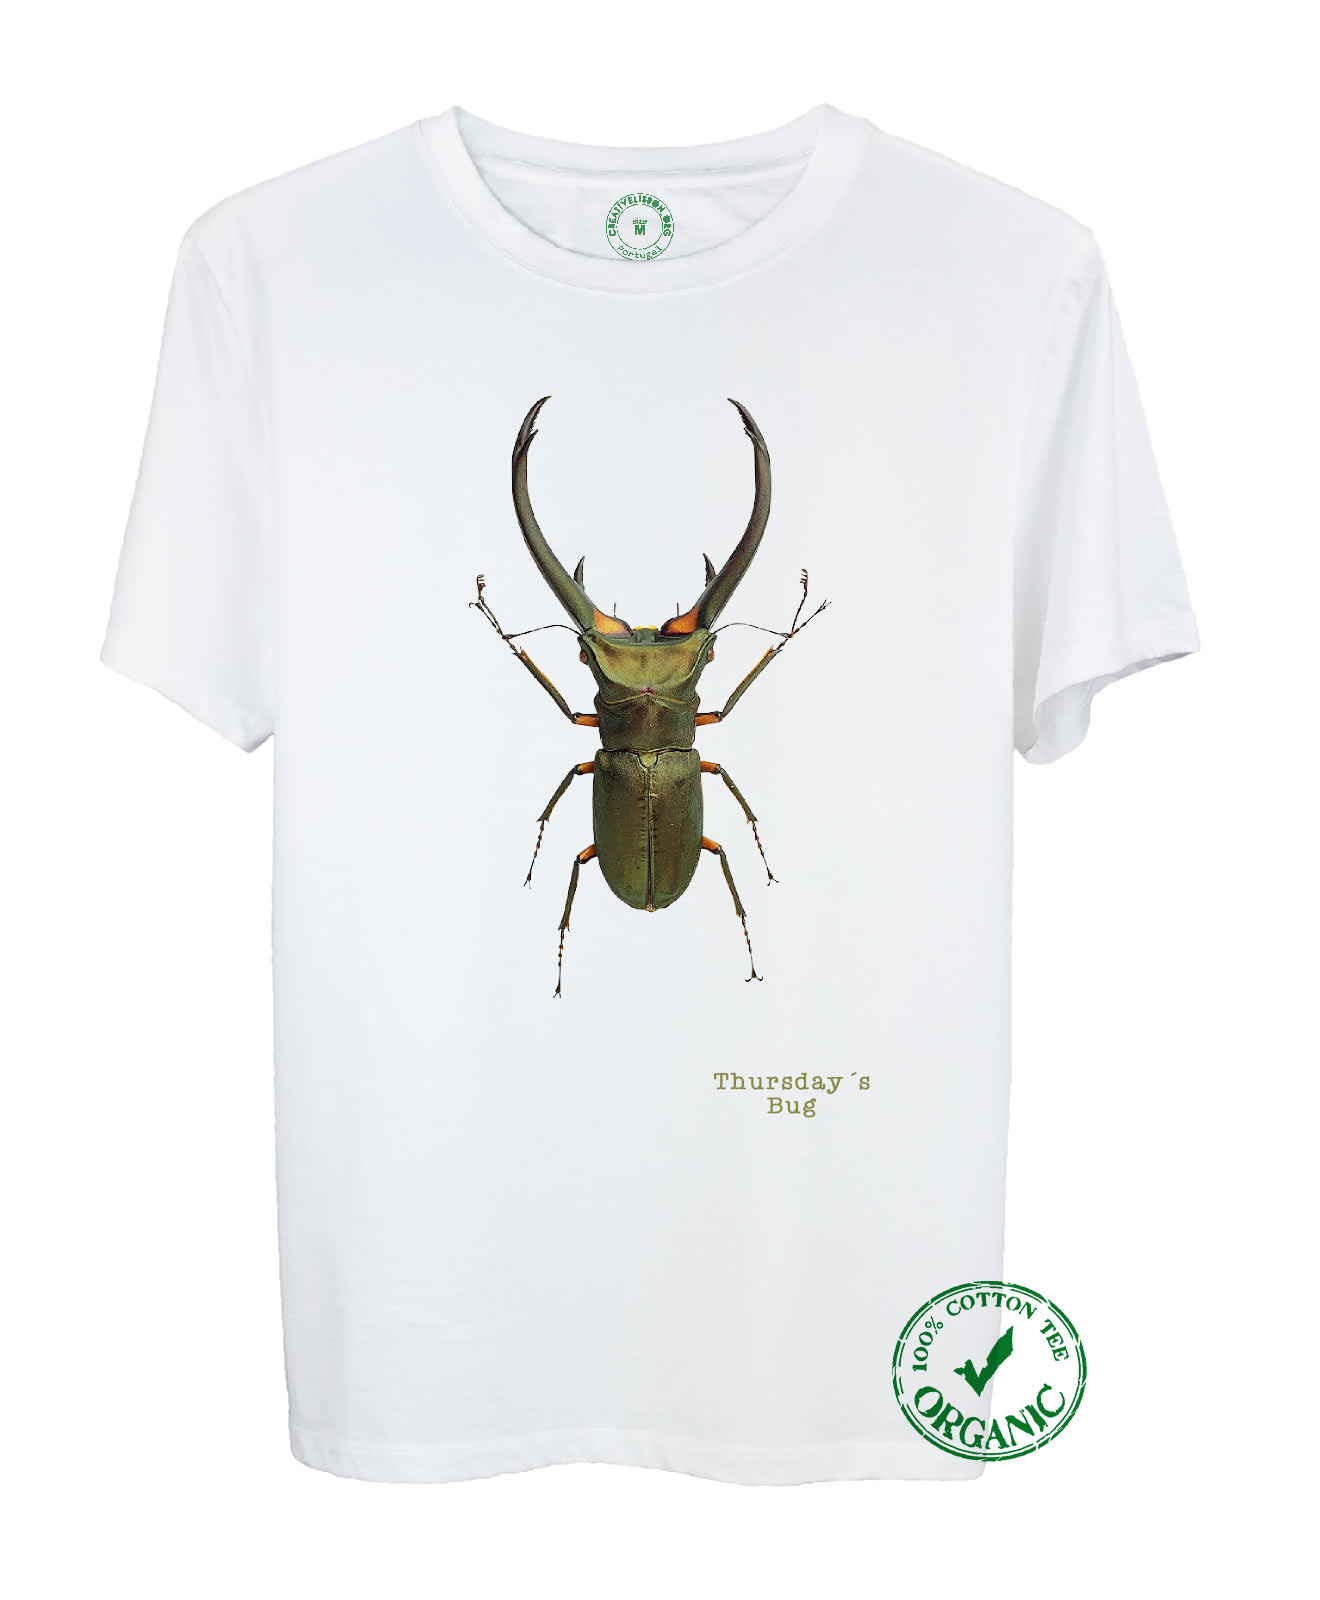 Thursday Bug Organic T-shirt